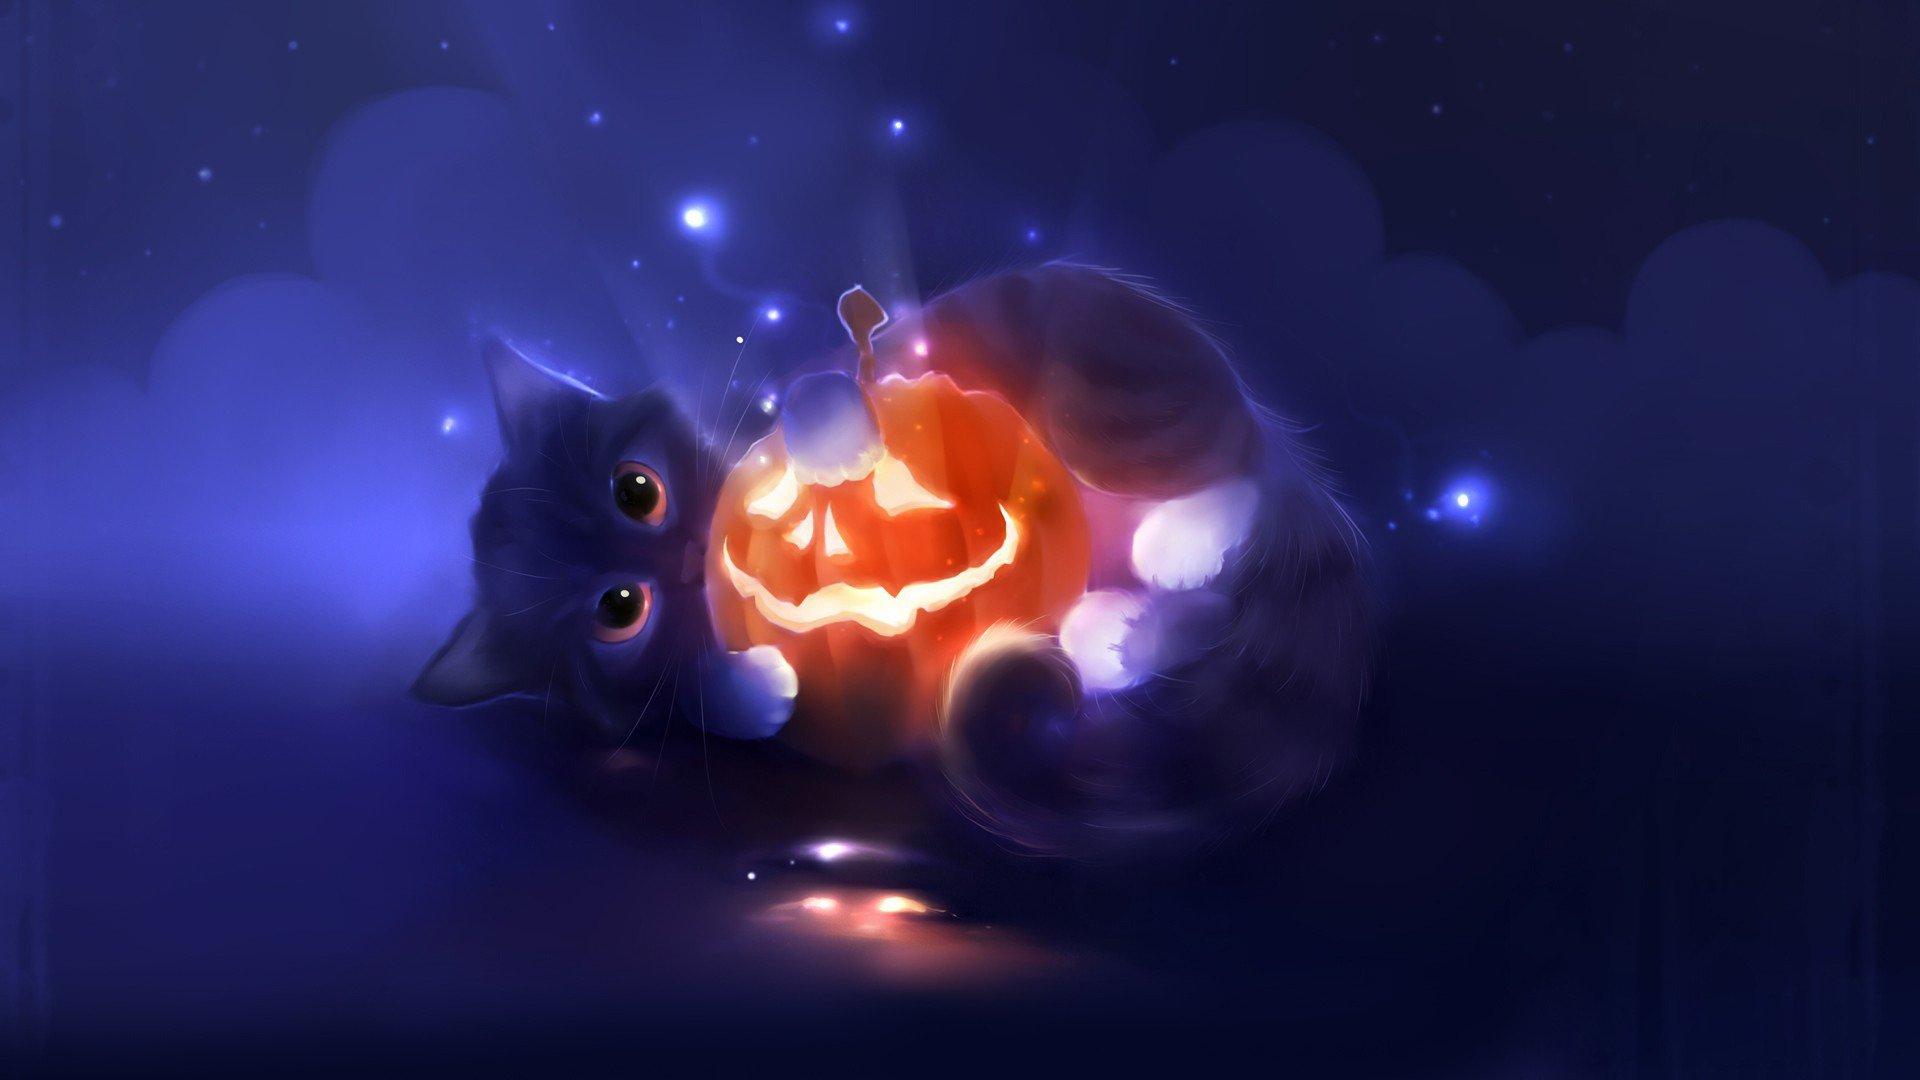 Cat Halloween Background Cute 1920x1080 Download Hd Wallpaper Wallpapertip